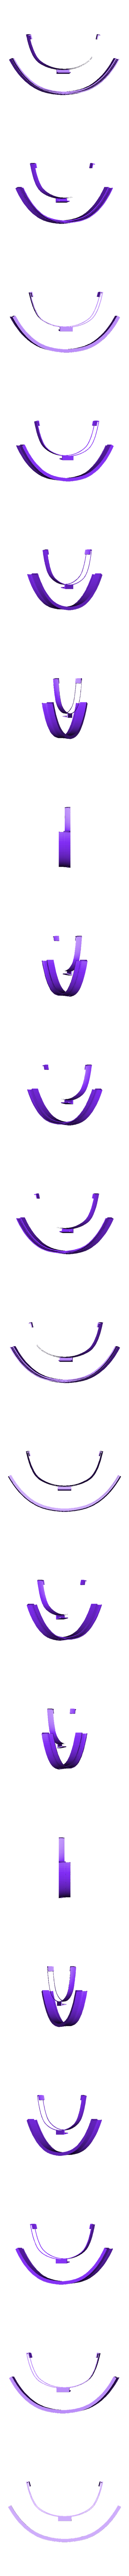 v1.1-EyesShield.stl Download free STL file Hopio Simple Eyes Shield v1.1 • 3D printer design, hopio